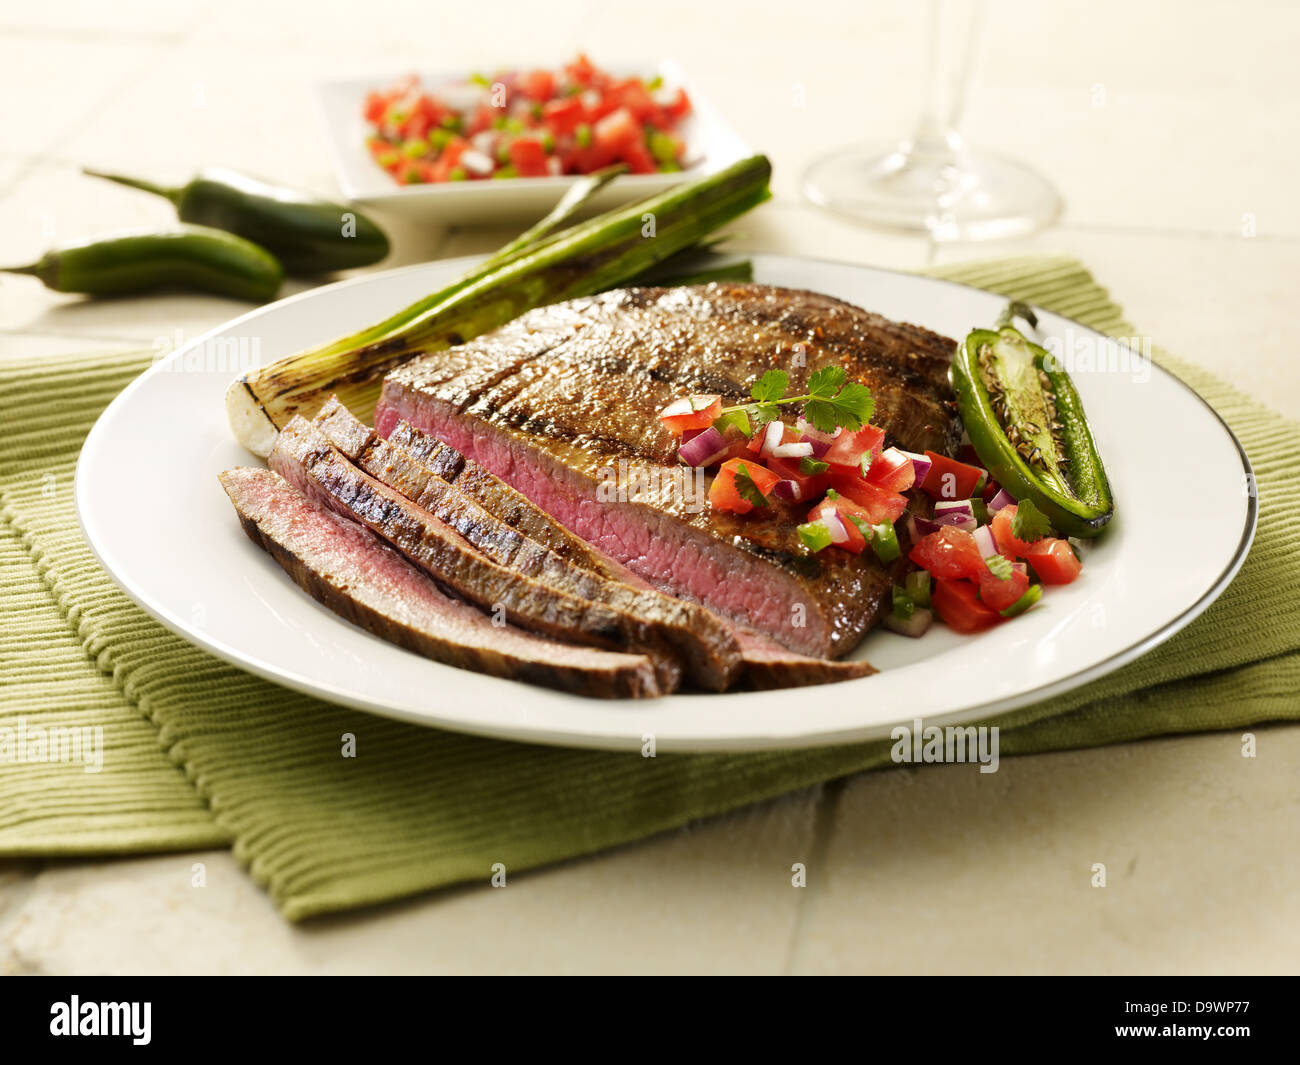 flank steak cut - Stock Image